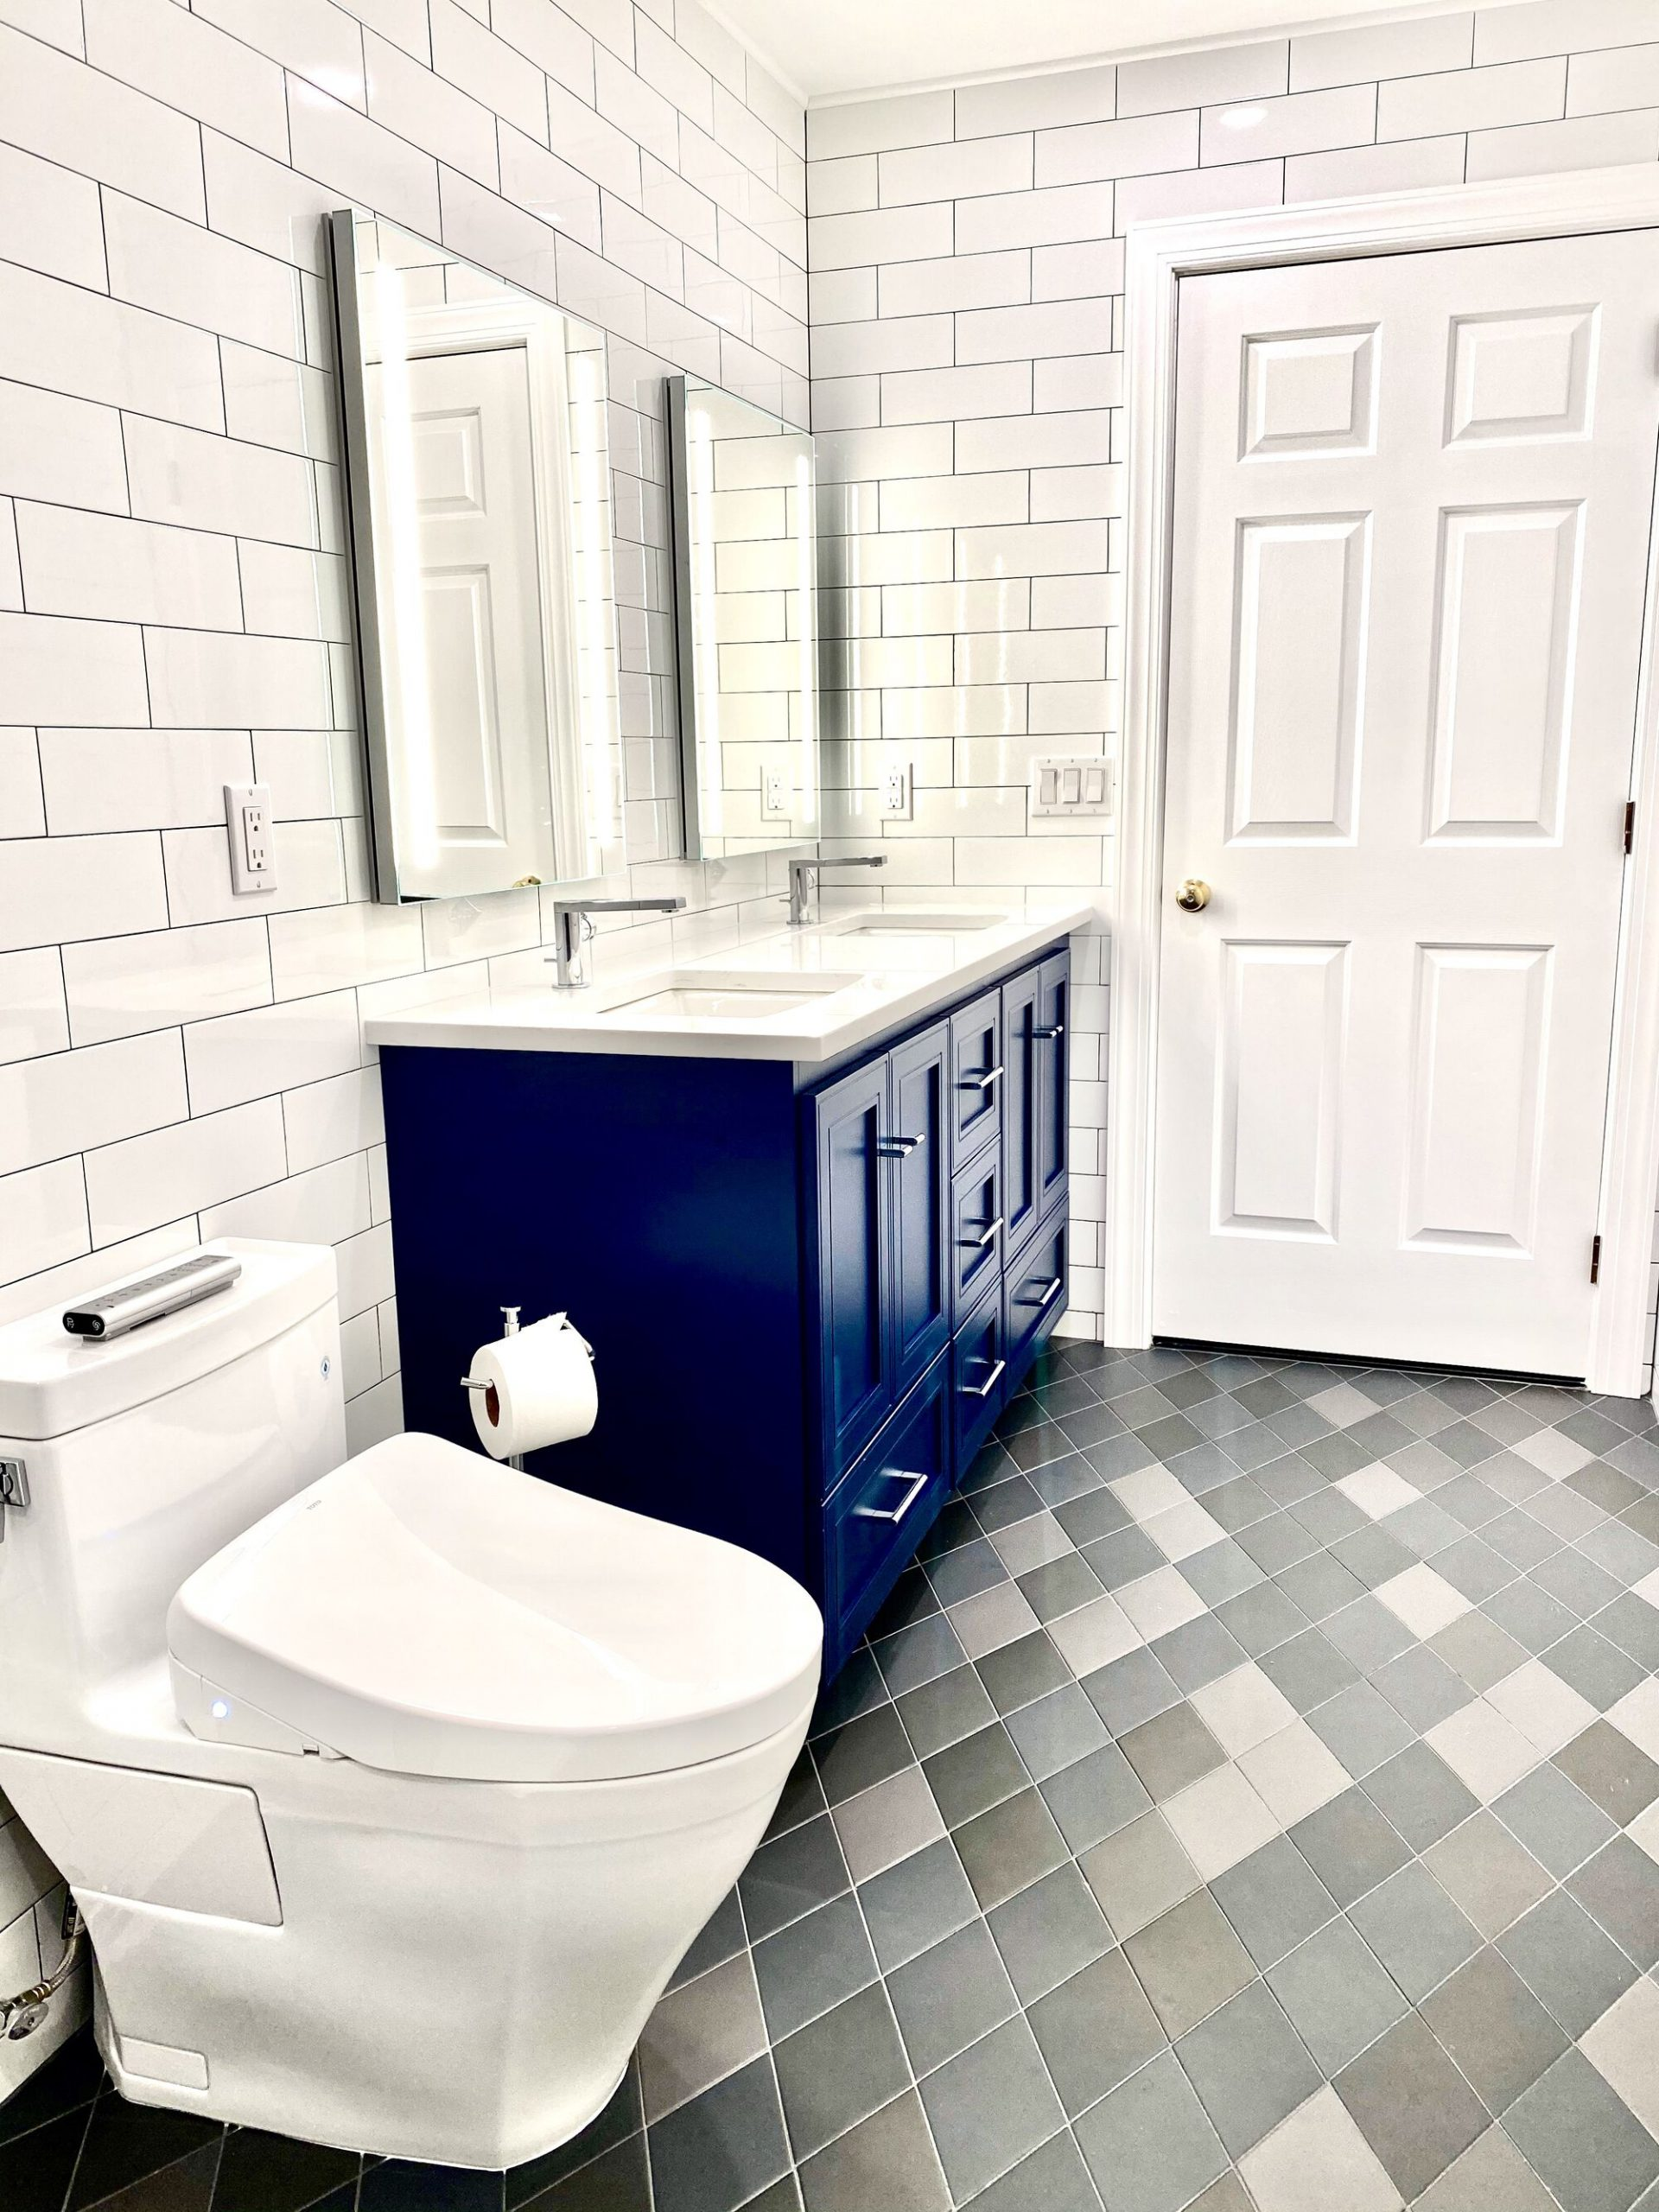 Custom Blue Double Sink Vanity, Oversized Subway Tiled Walls in Dayton, Middlesex County NJ